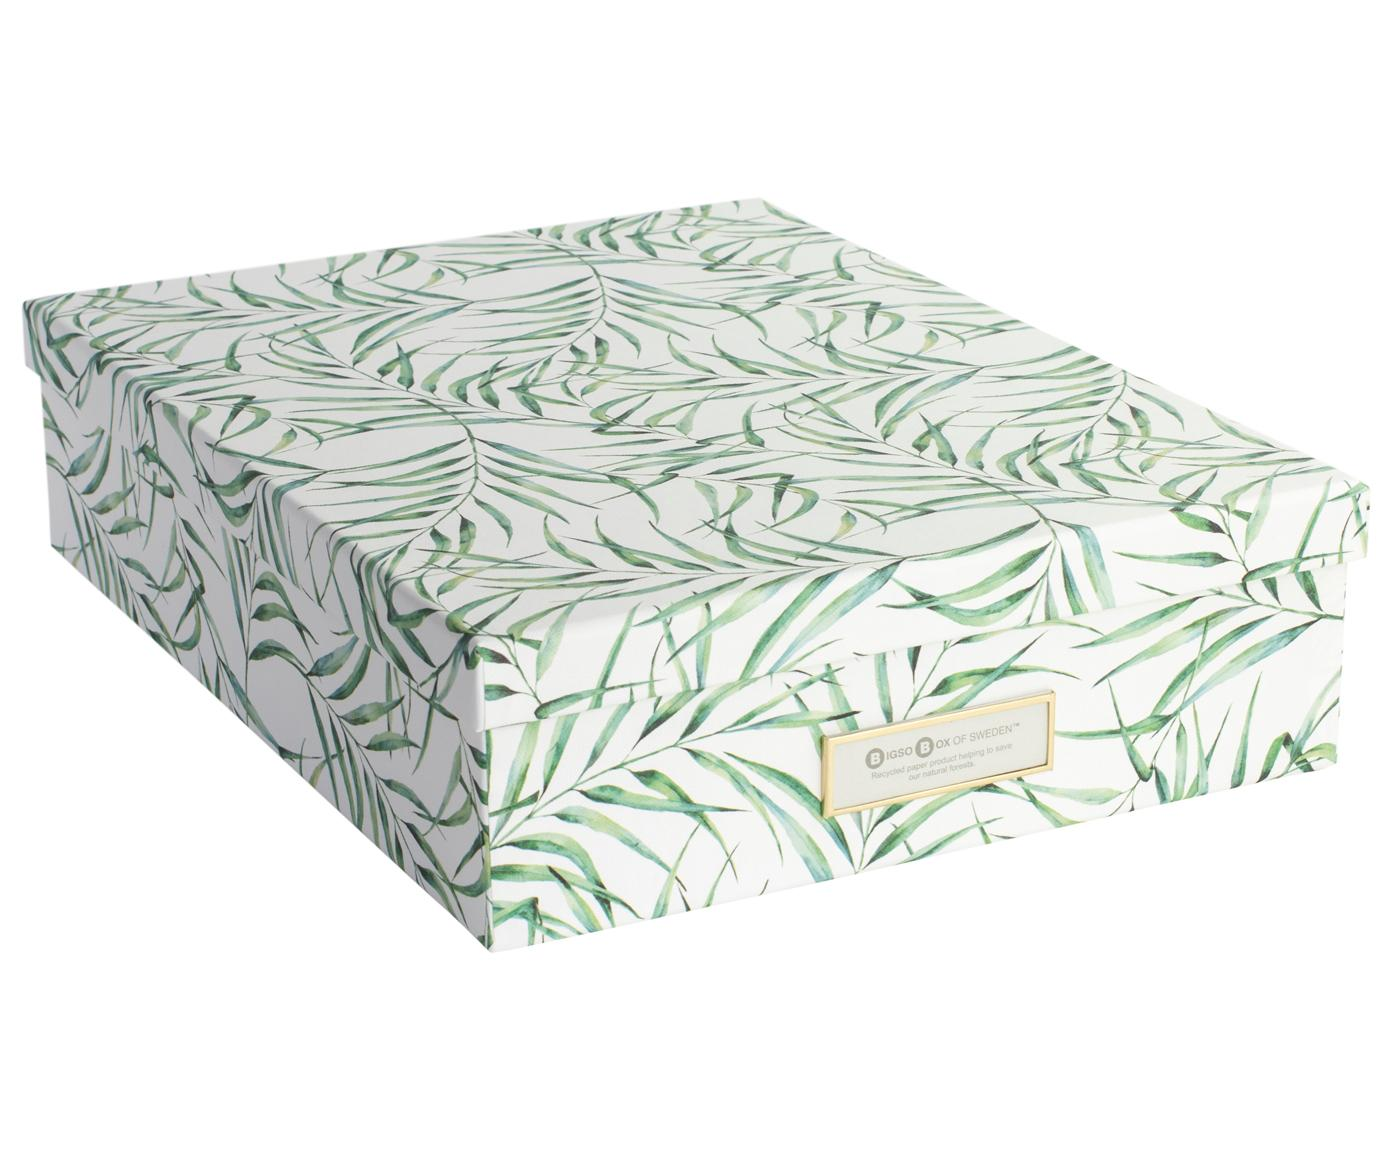 Caja Leaf, Cartón laminado macizo, Blanco, verde, An 35 x Al 9 cm